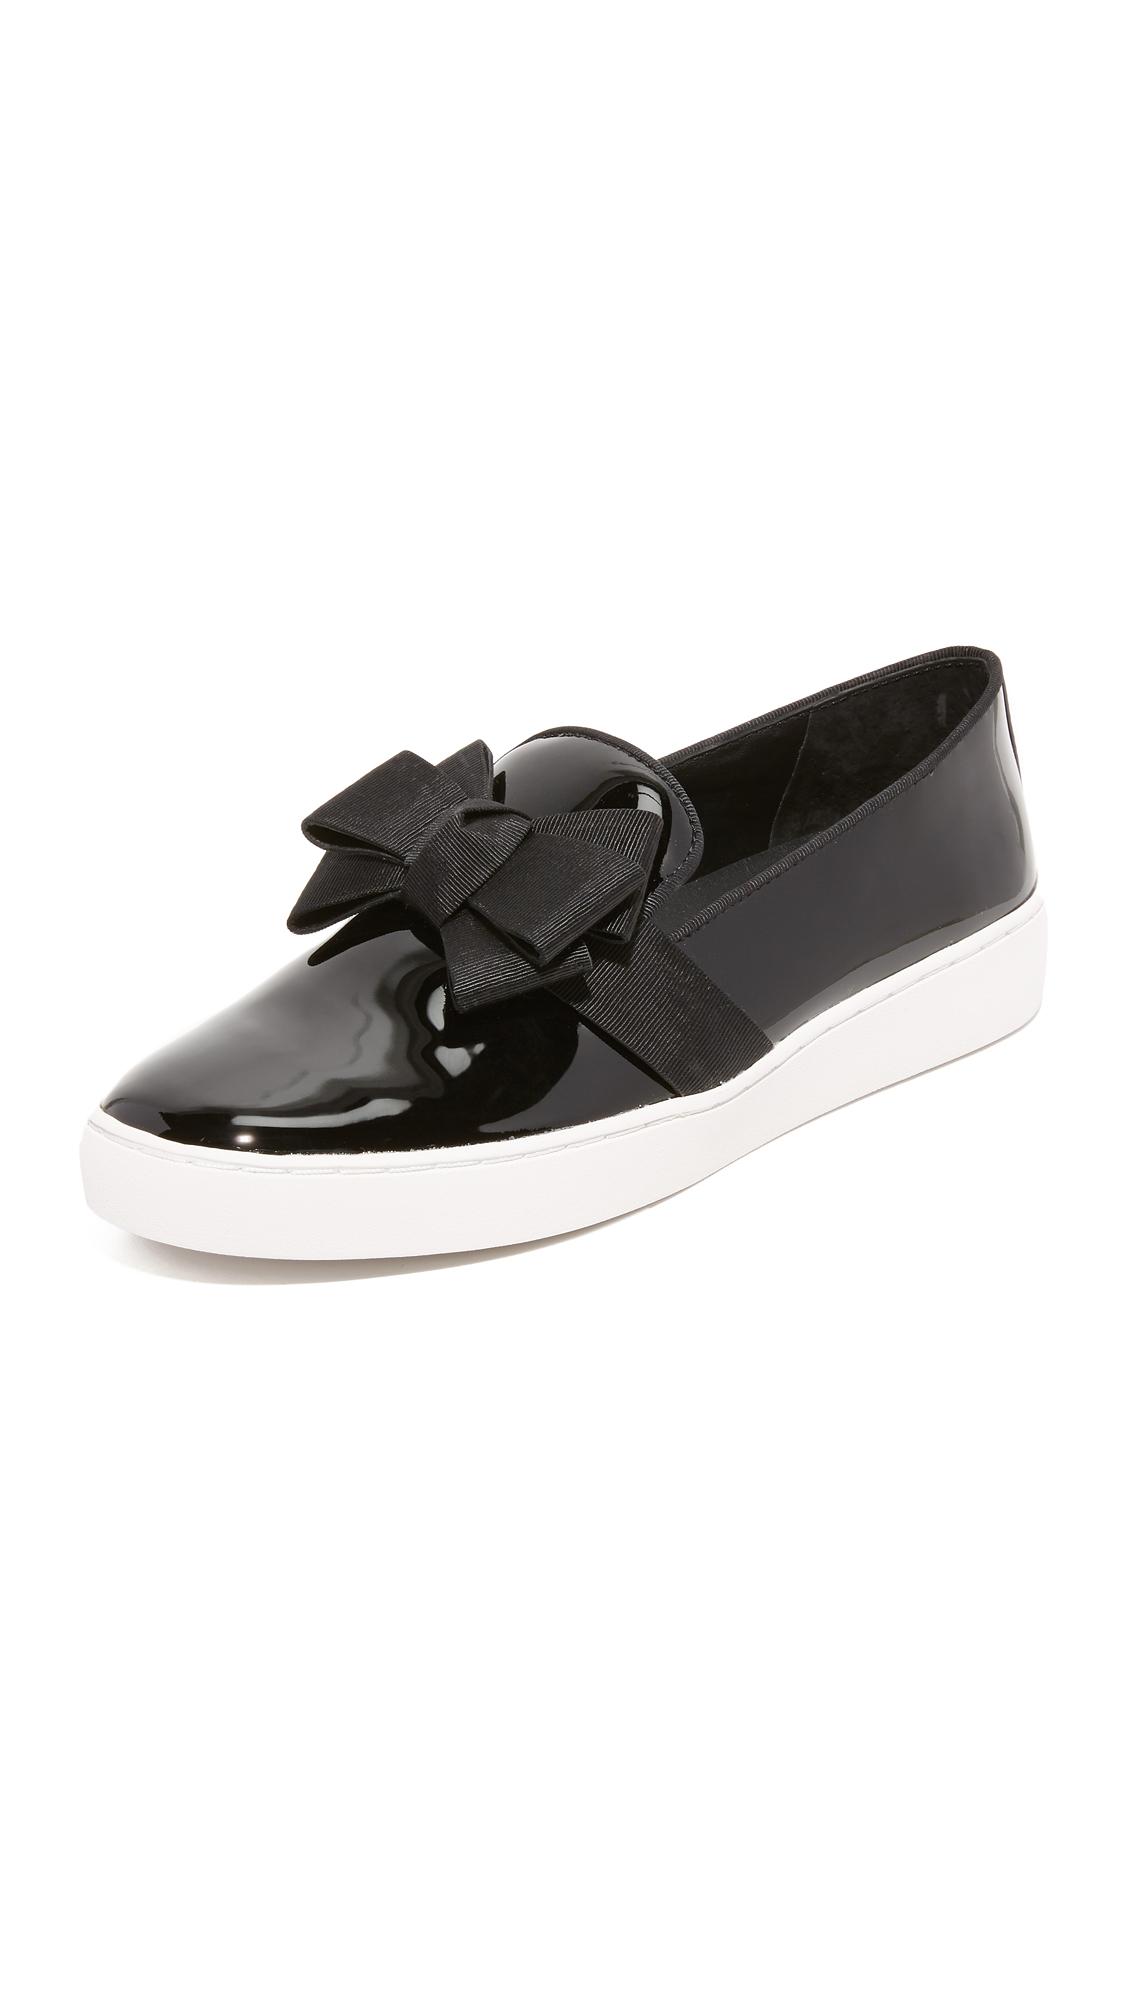 michael kors female 188971 michael kors collection val bow slip on sneakers black